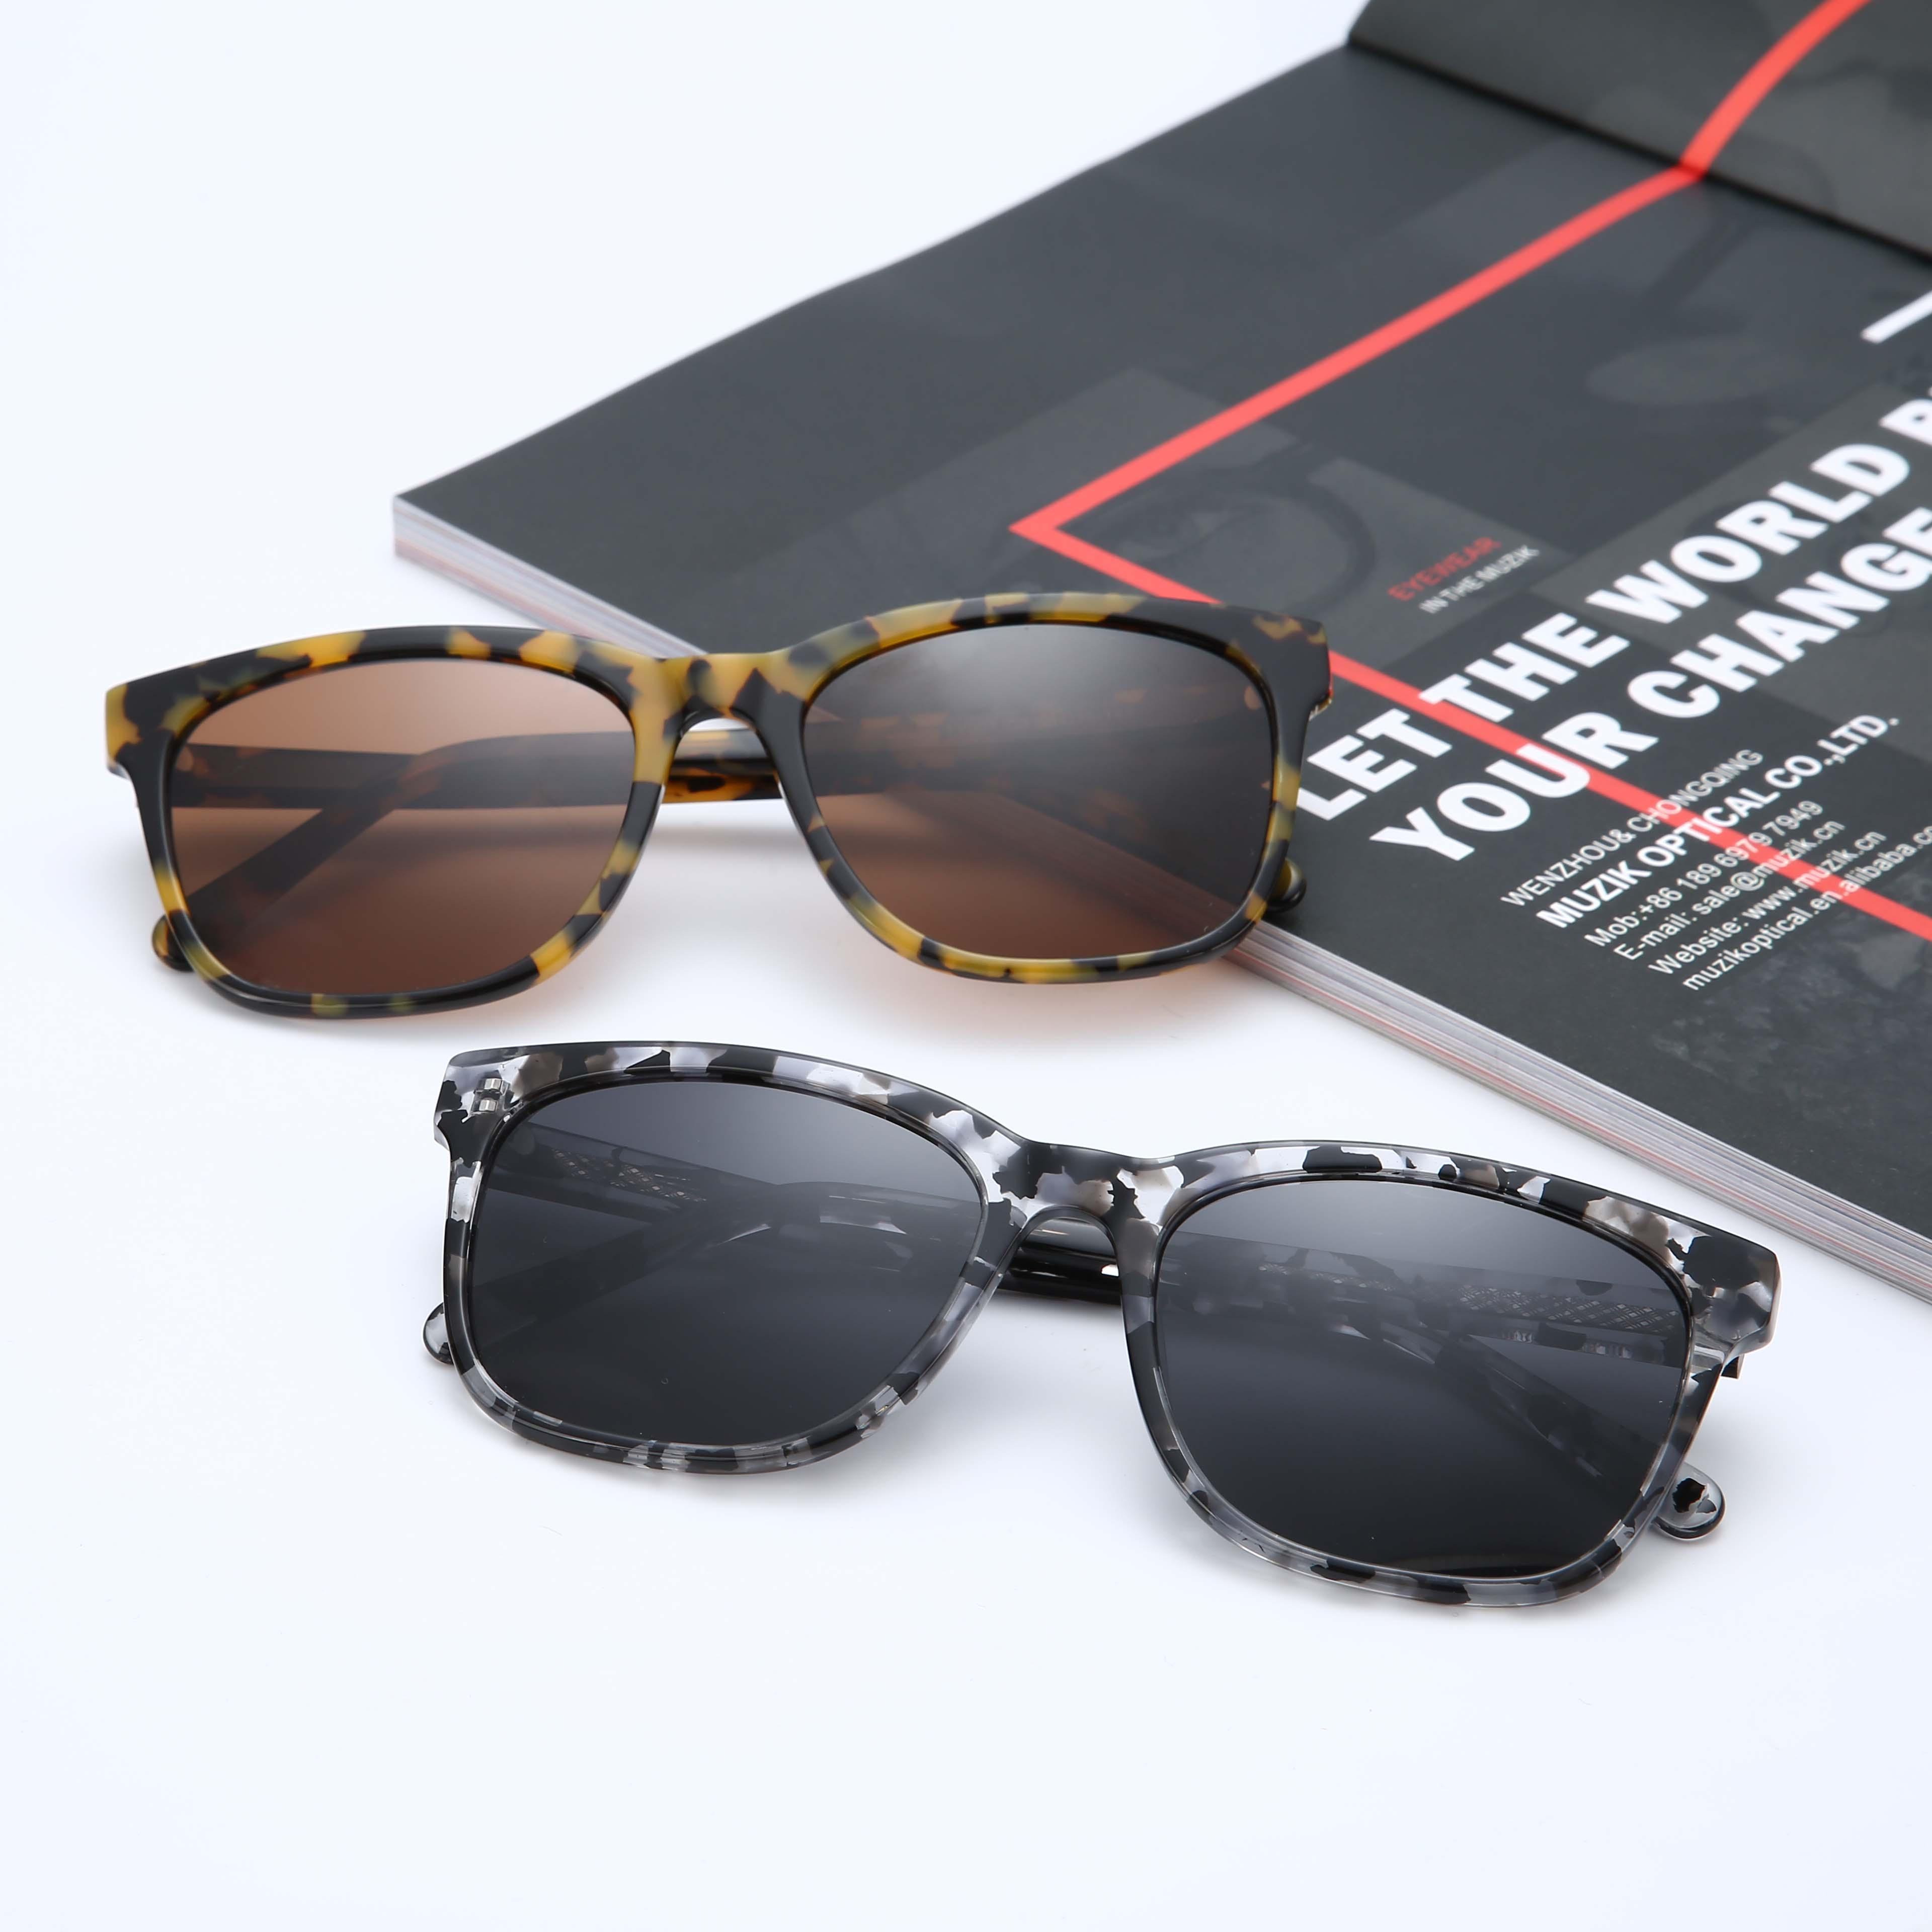 TY007 2019 wholesale custom men and women sun glasses fashion brand polarized acetate frame designer vintage sunglasses, N/a